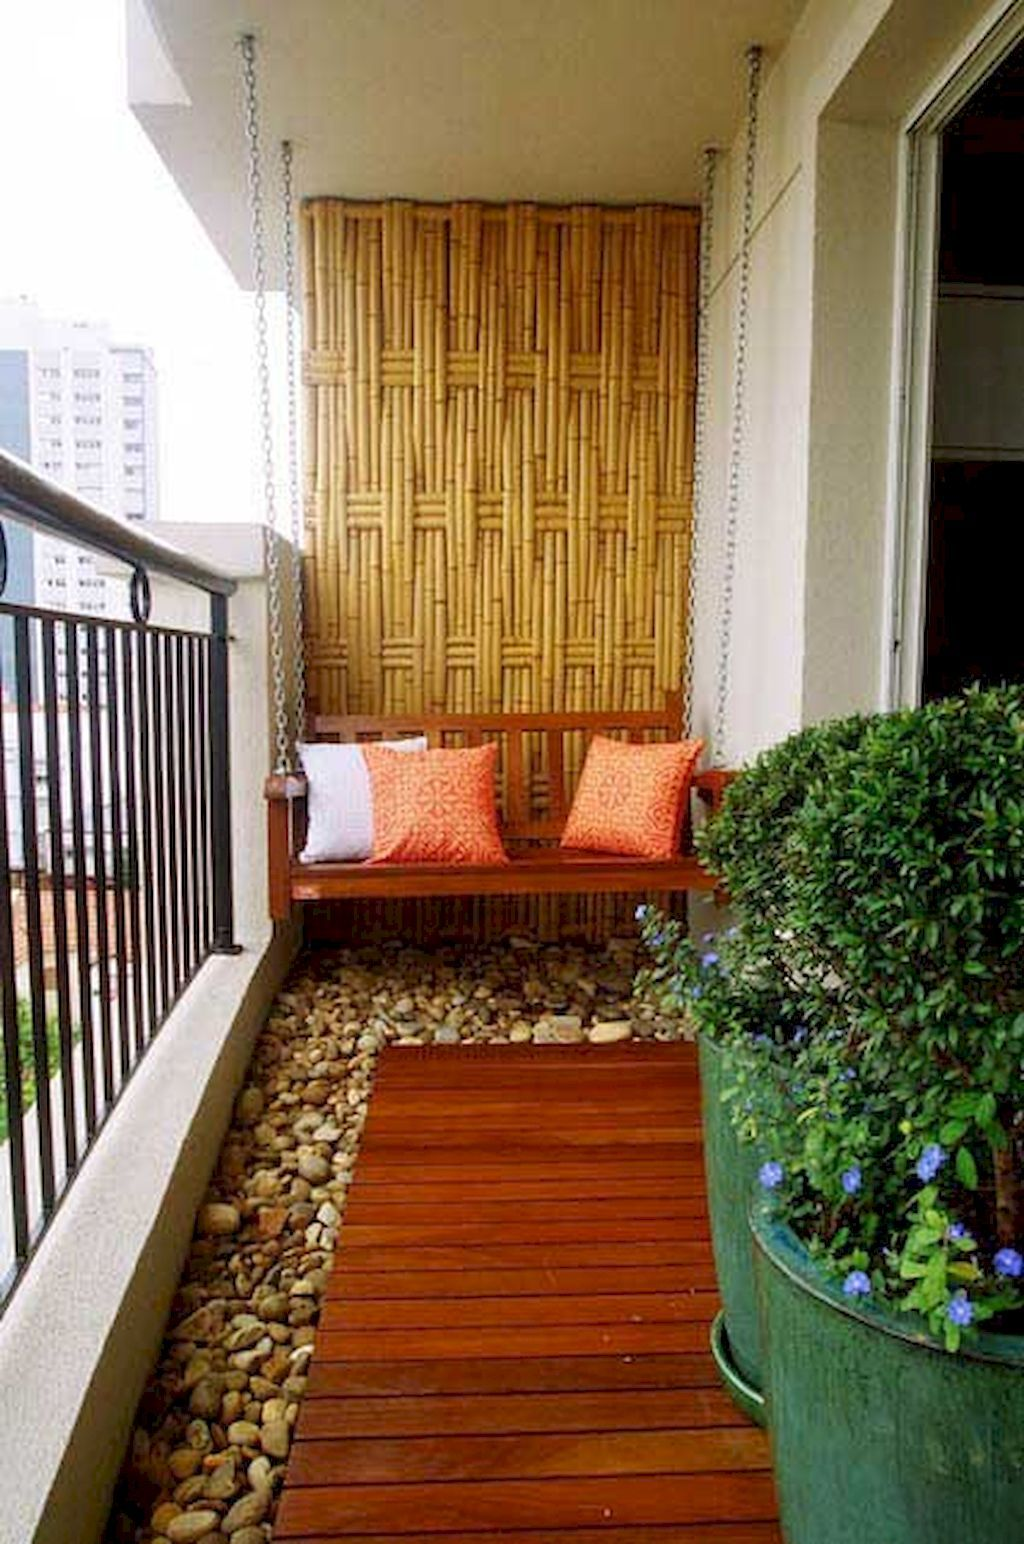 Adorable 80+ Beautiful and Cozy Apartment Balcony Decor Ideas https ...